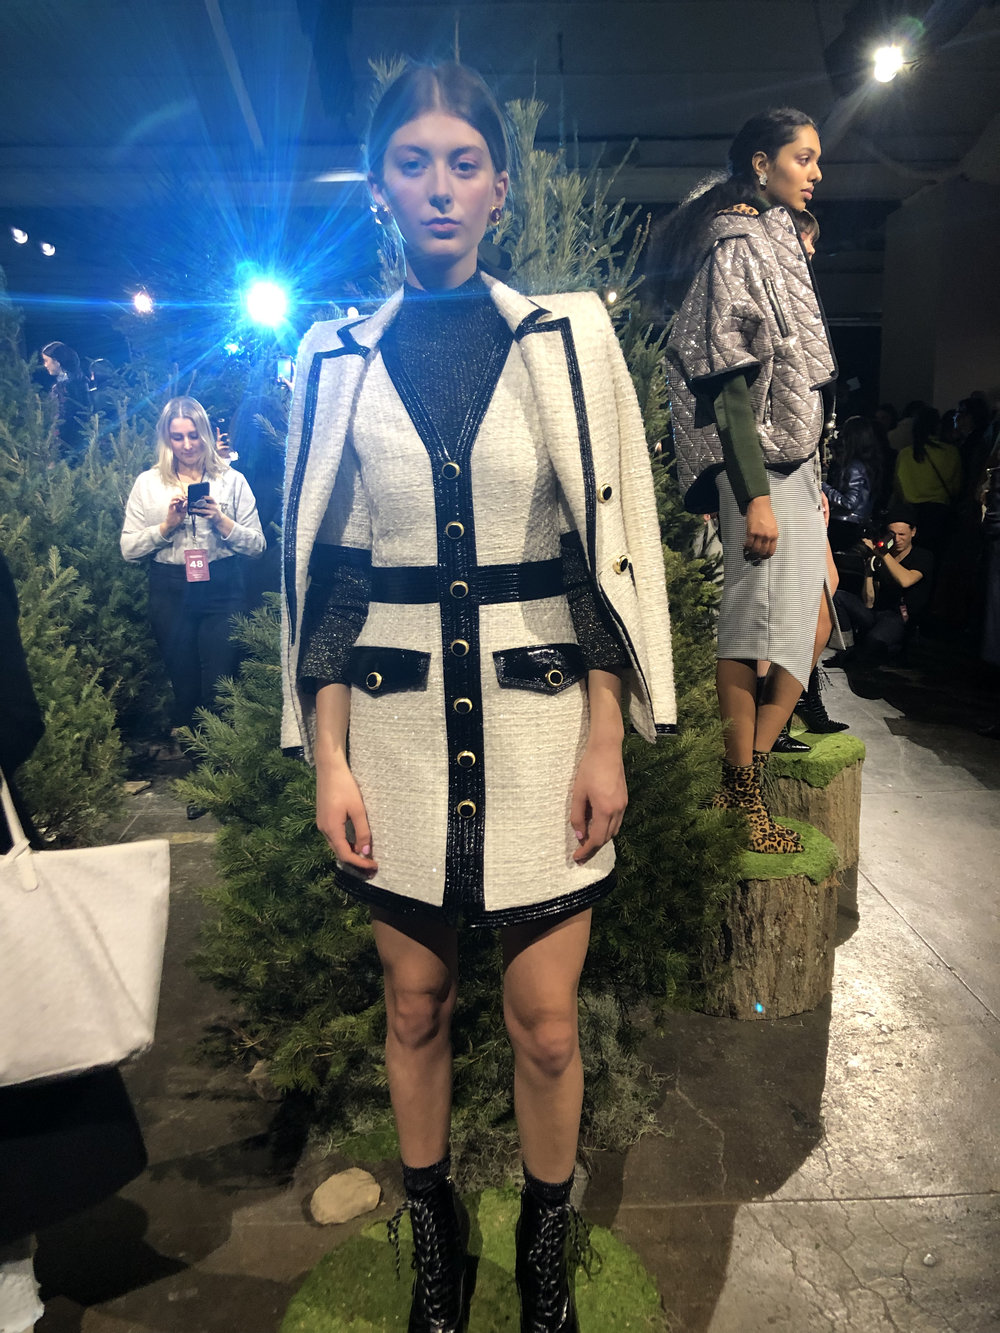 Model is wearing: Black LILA Turtleneck, Ivory SIMONA Dress, Ivory VERONA Jacket, Black PAULA Boots